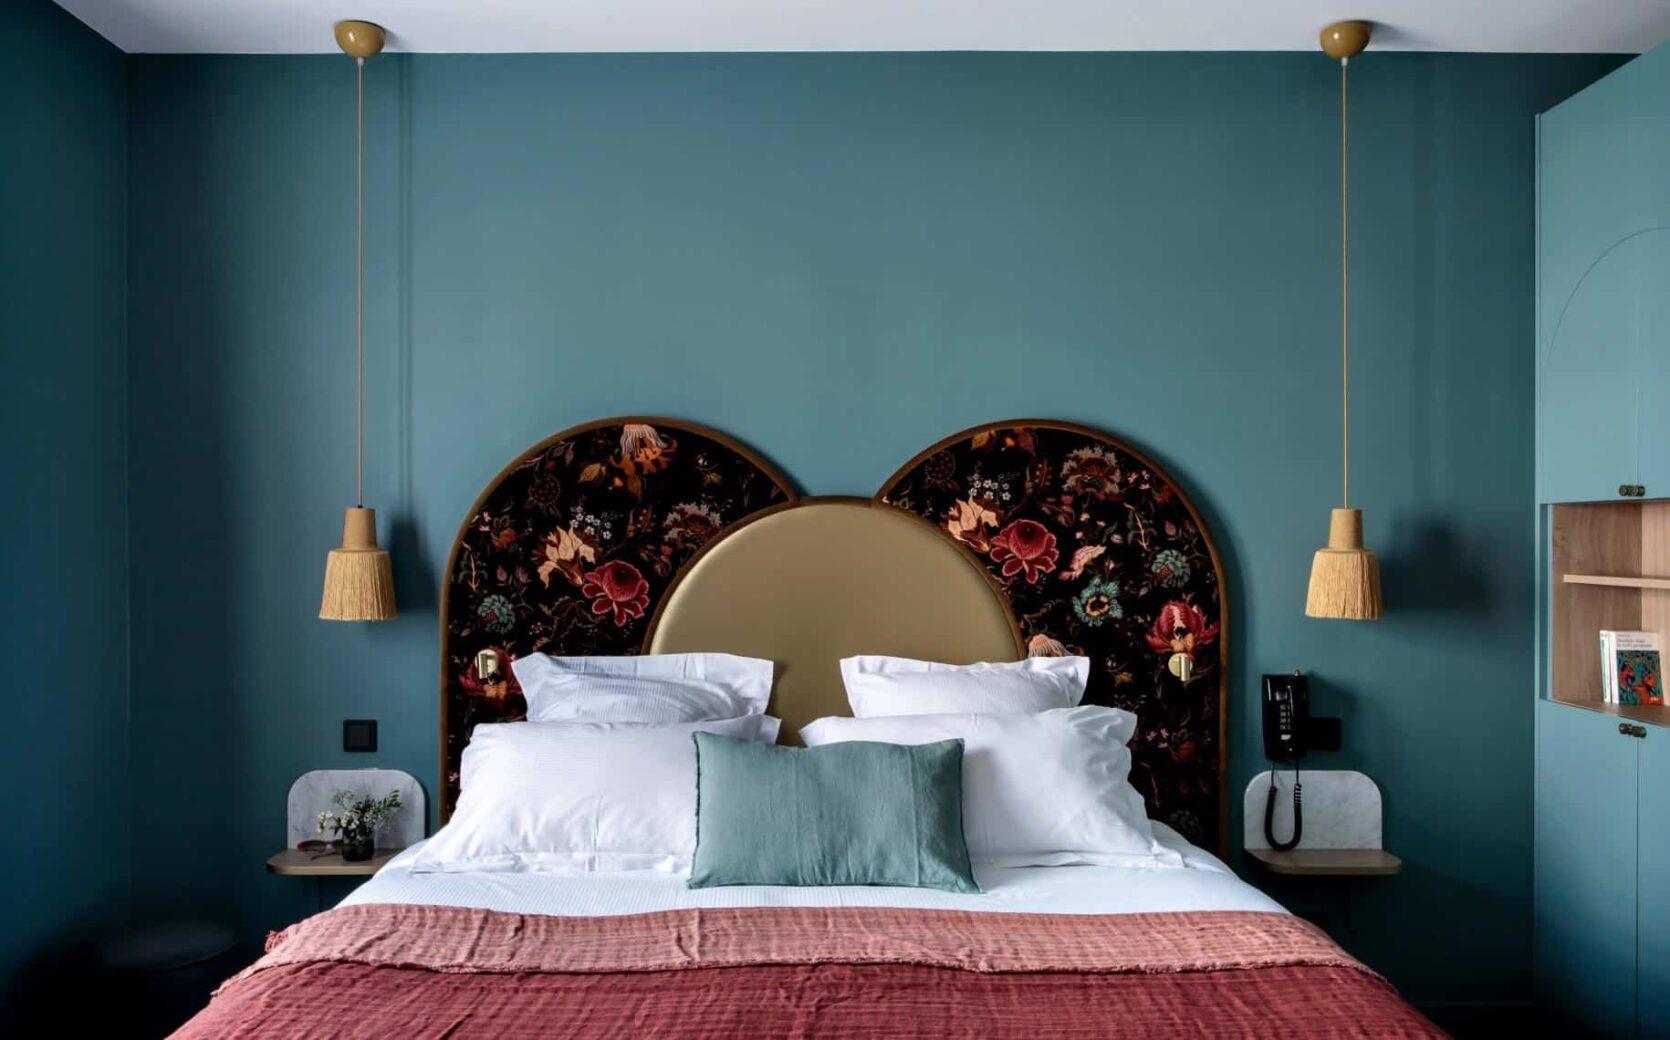 hotel leopold paris room 100095 1830 1140 crop